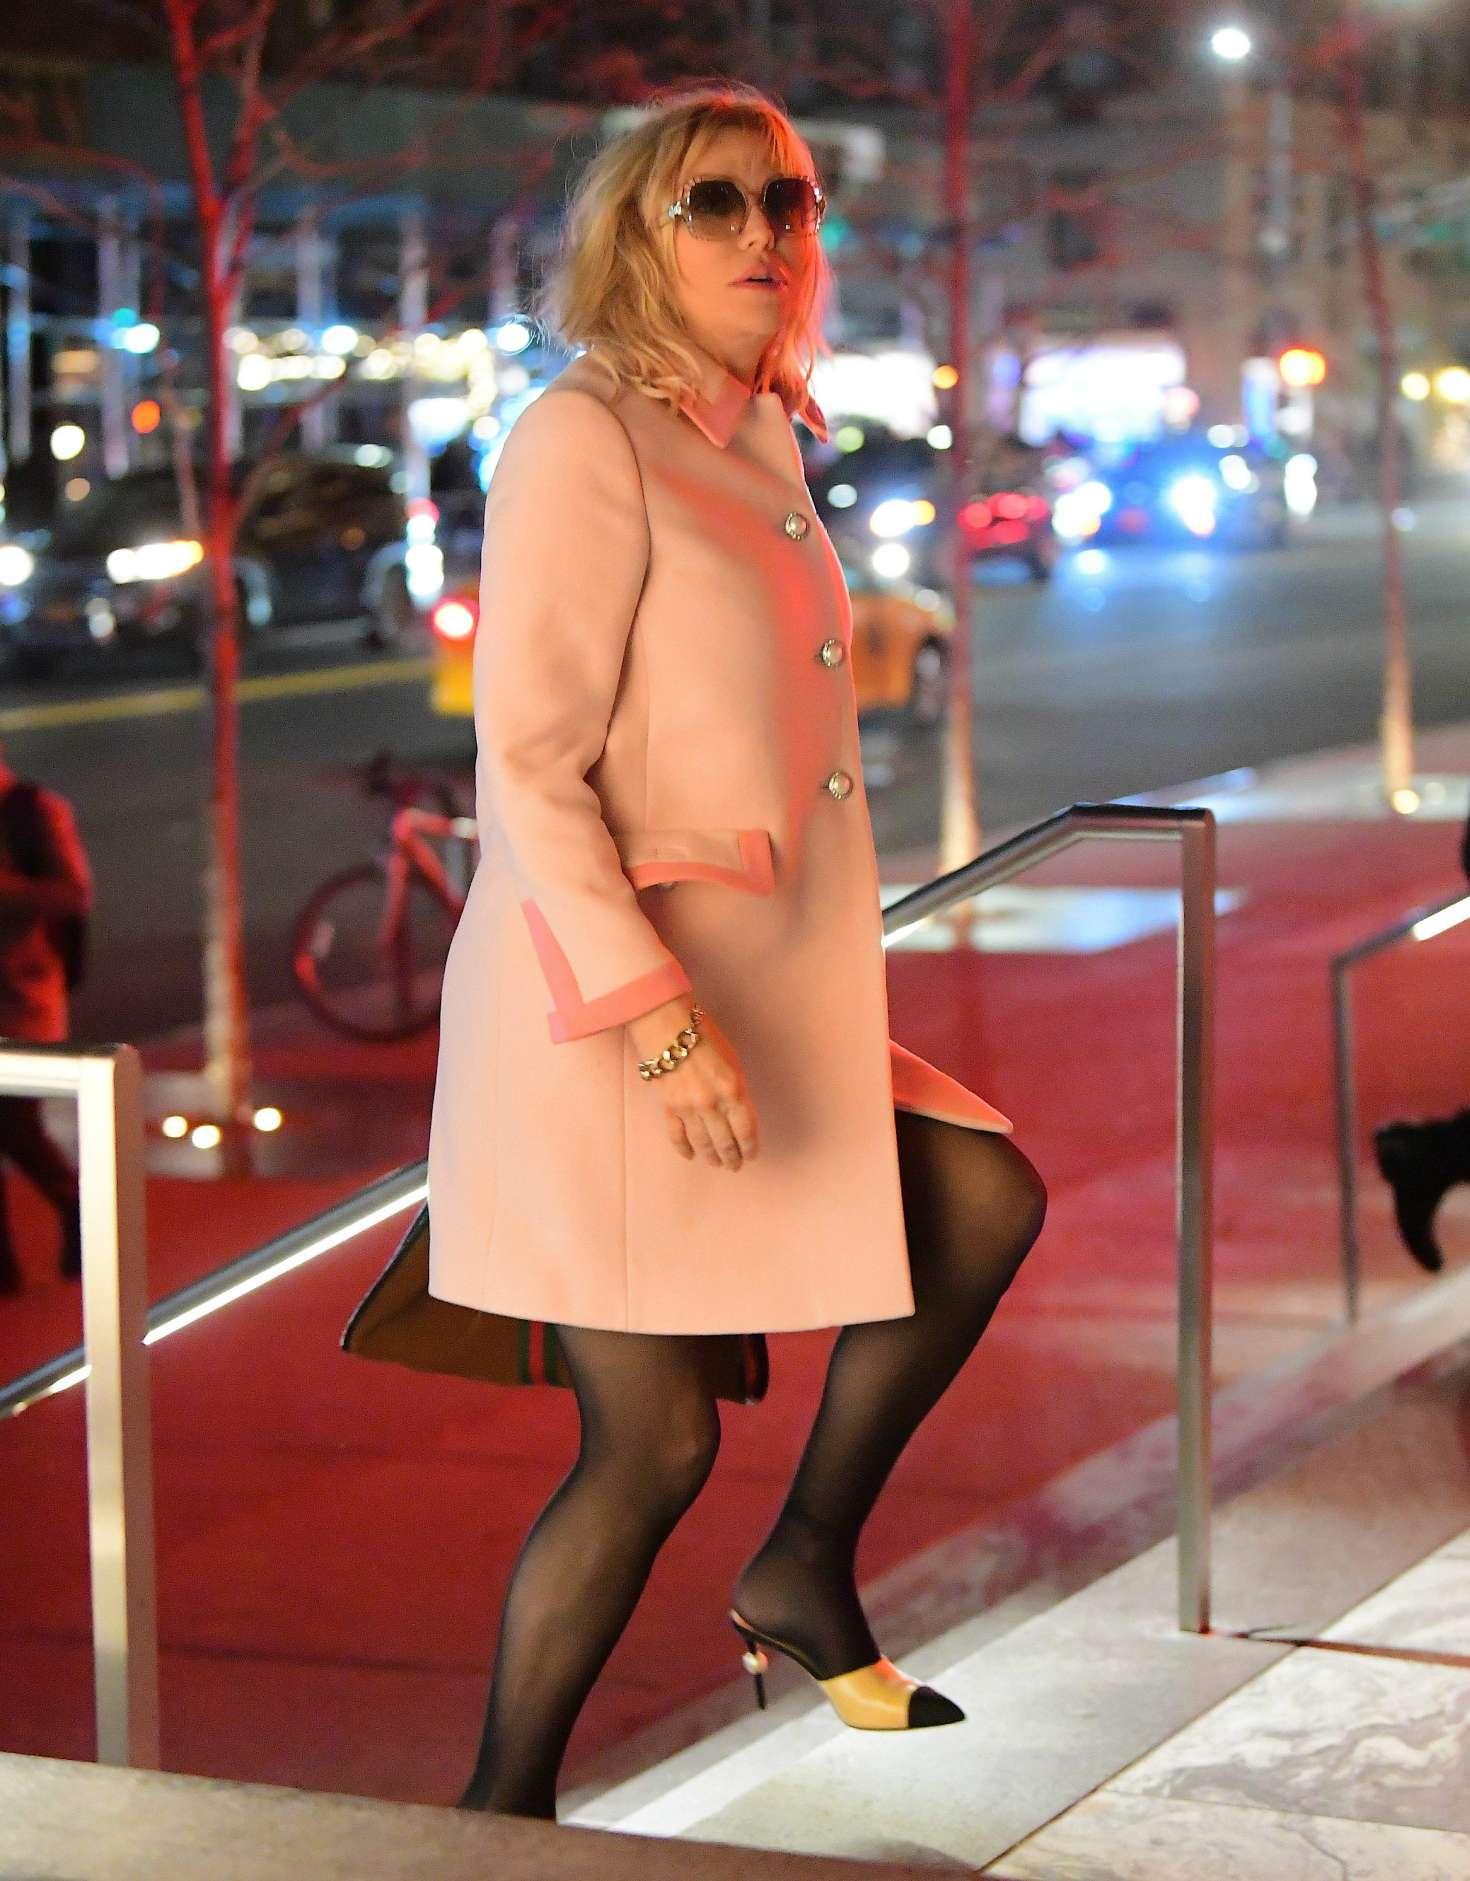 Courtney Love 2018 : Courtney Love: Arrives at the Mercer Kitchen -03